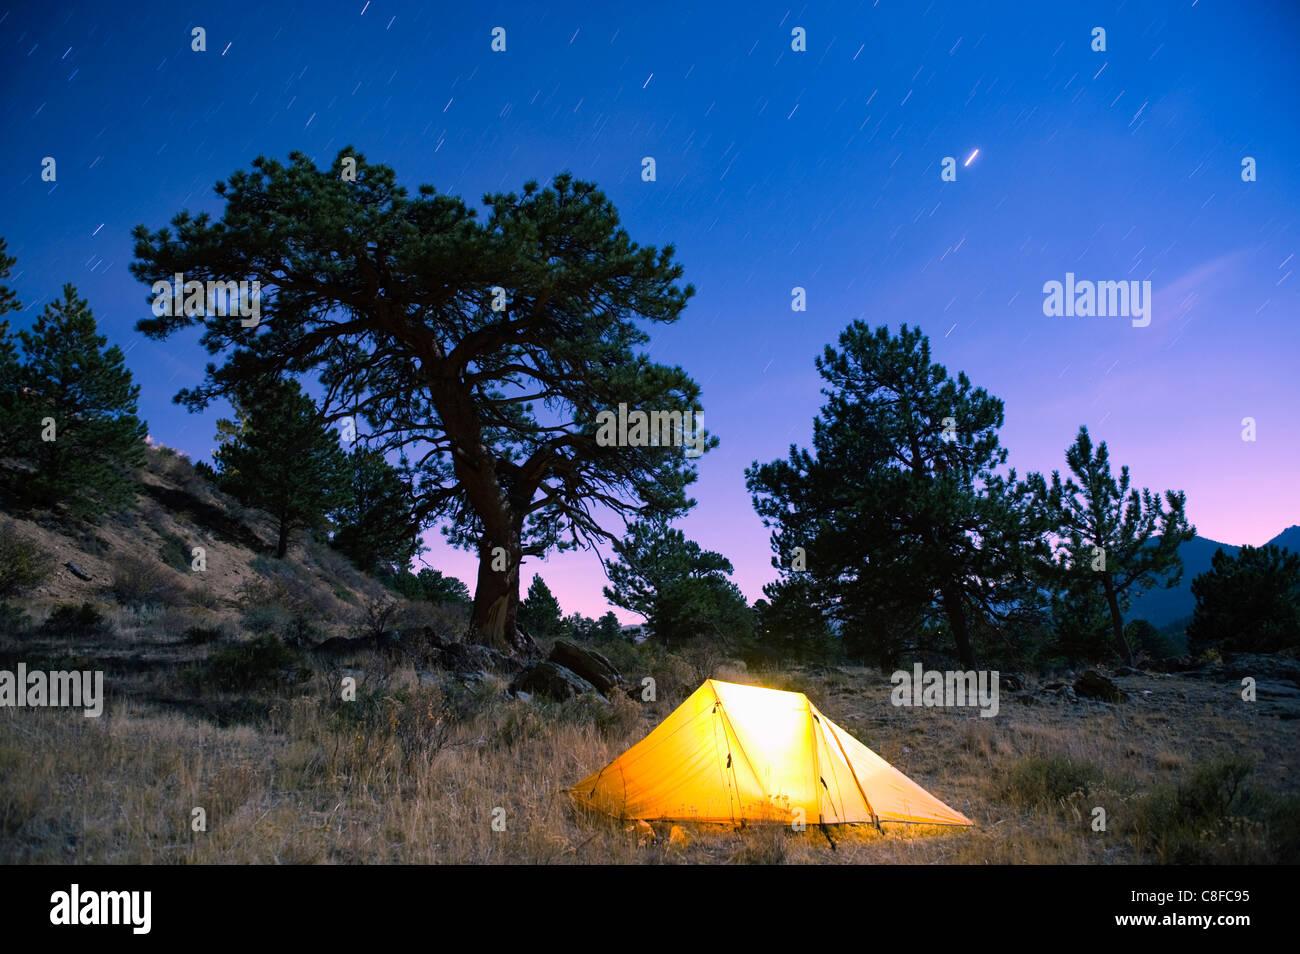 Tent illuminated under the night sky, Rocky Mountain National Park, Colorado, United States of America - Stock Image